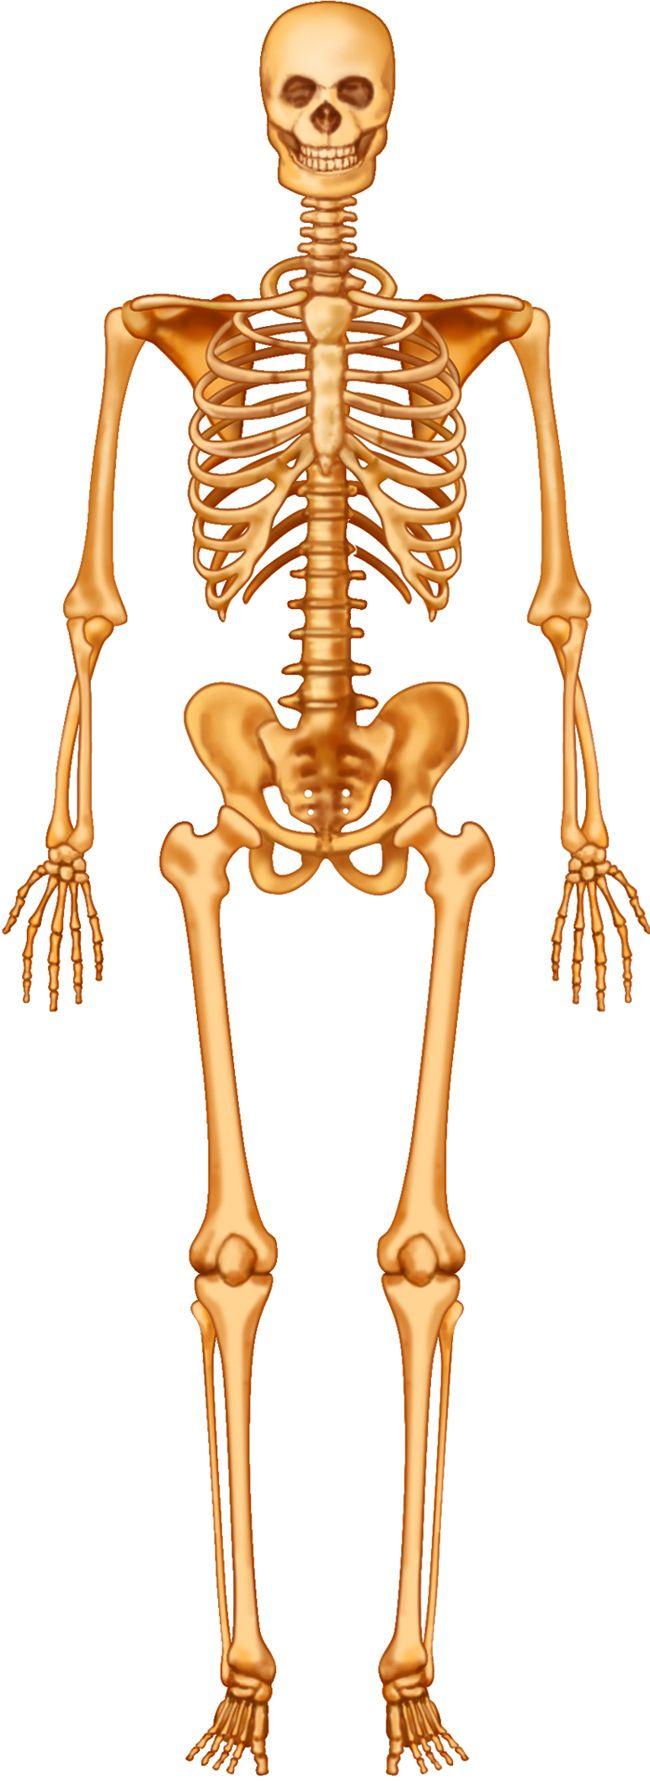 Unlabeled Human Skeleton Diagram - koibana.info   Human ...